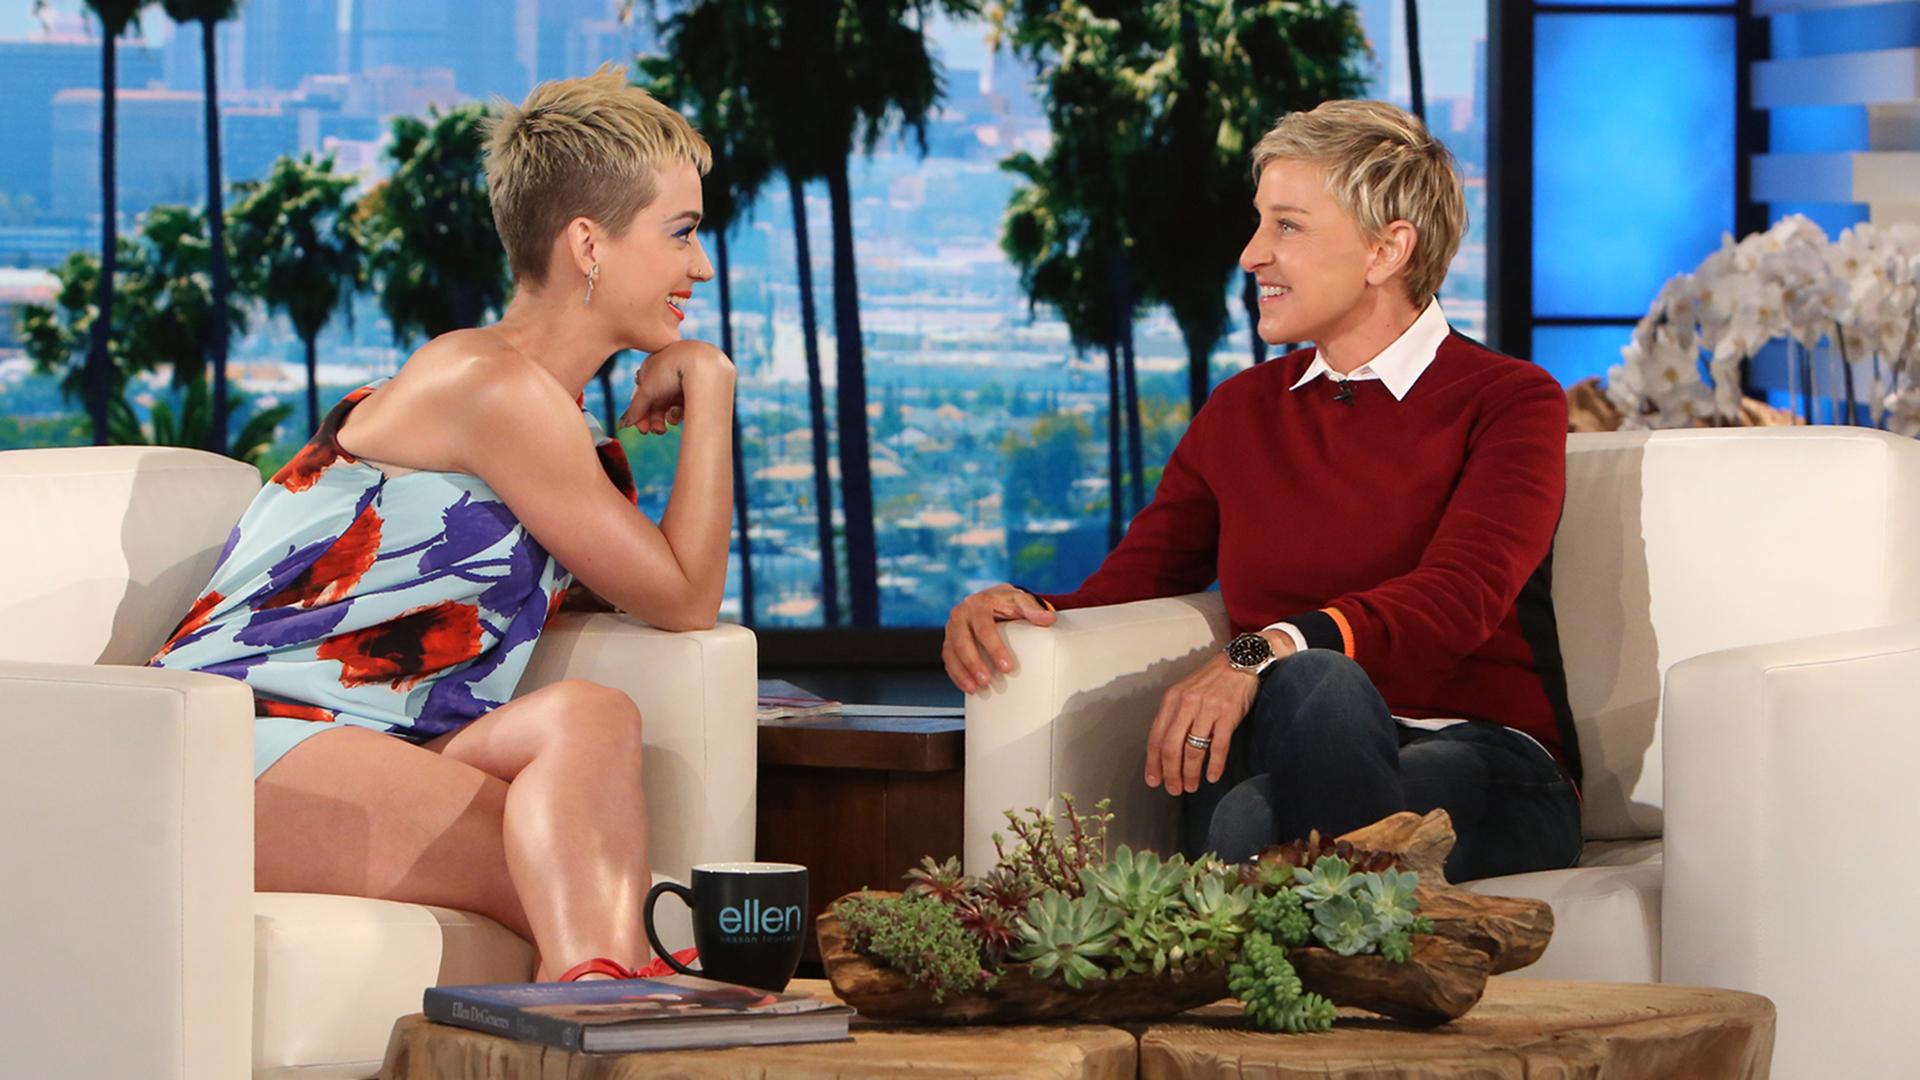 Katy Perry Tells Ellen Degeneres The Real Reason Behind